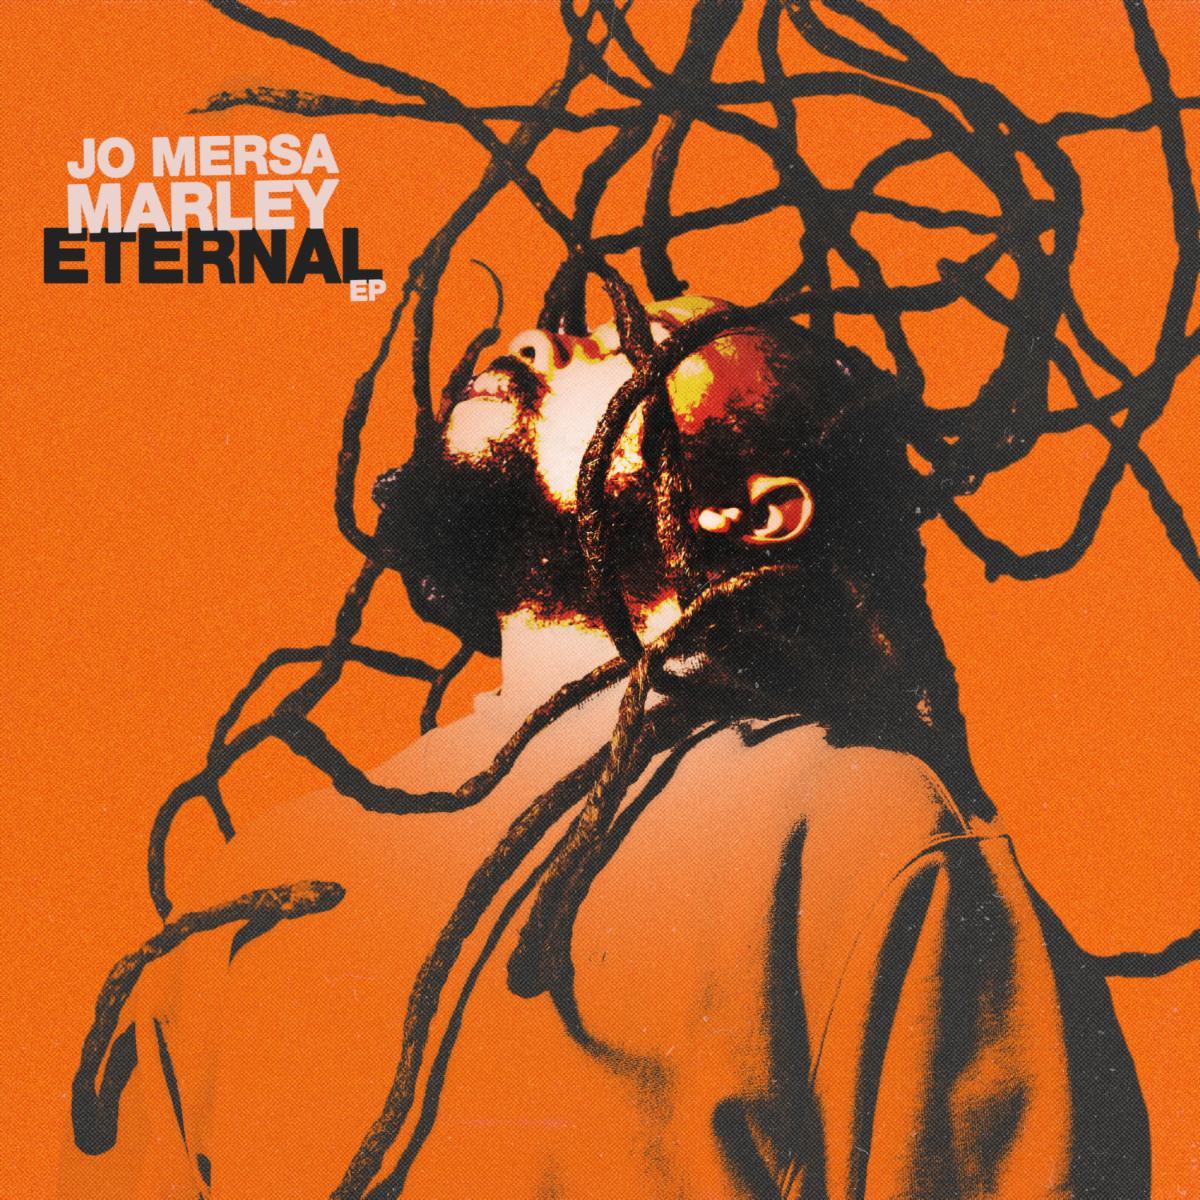 Jo Mersa Marley's New EP 'Eternal' A Fresh Take On The Link Between Reggae, Dancehall and Hip Hop